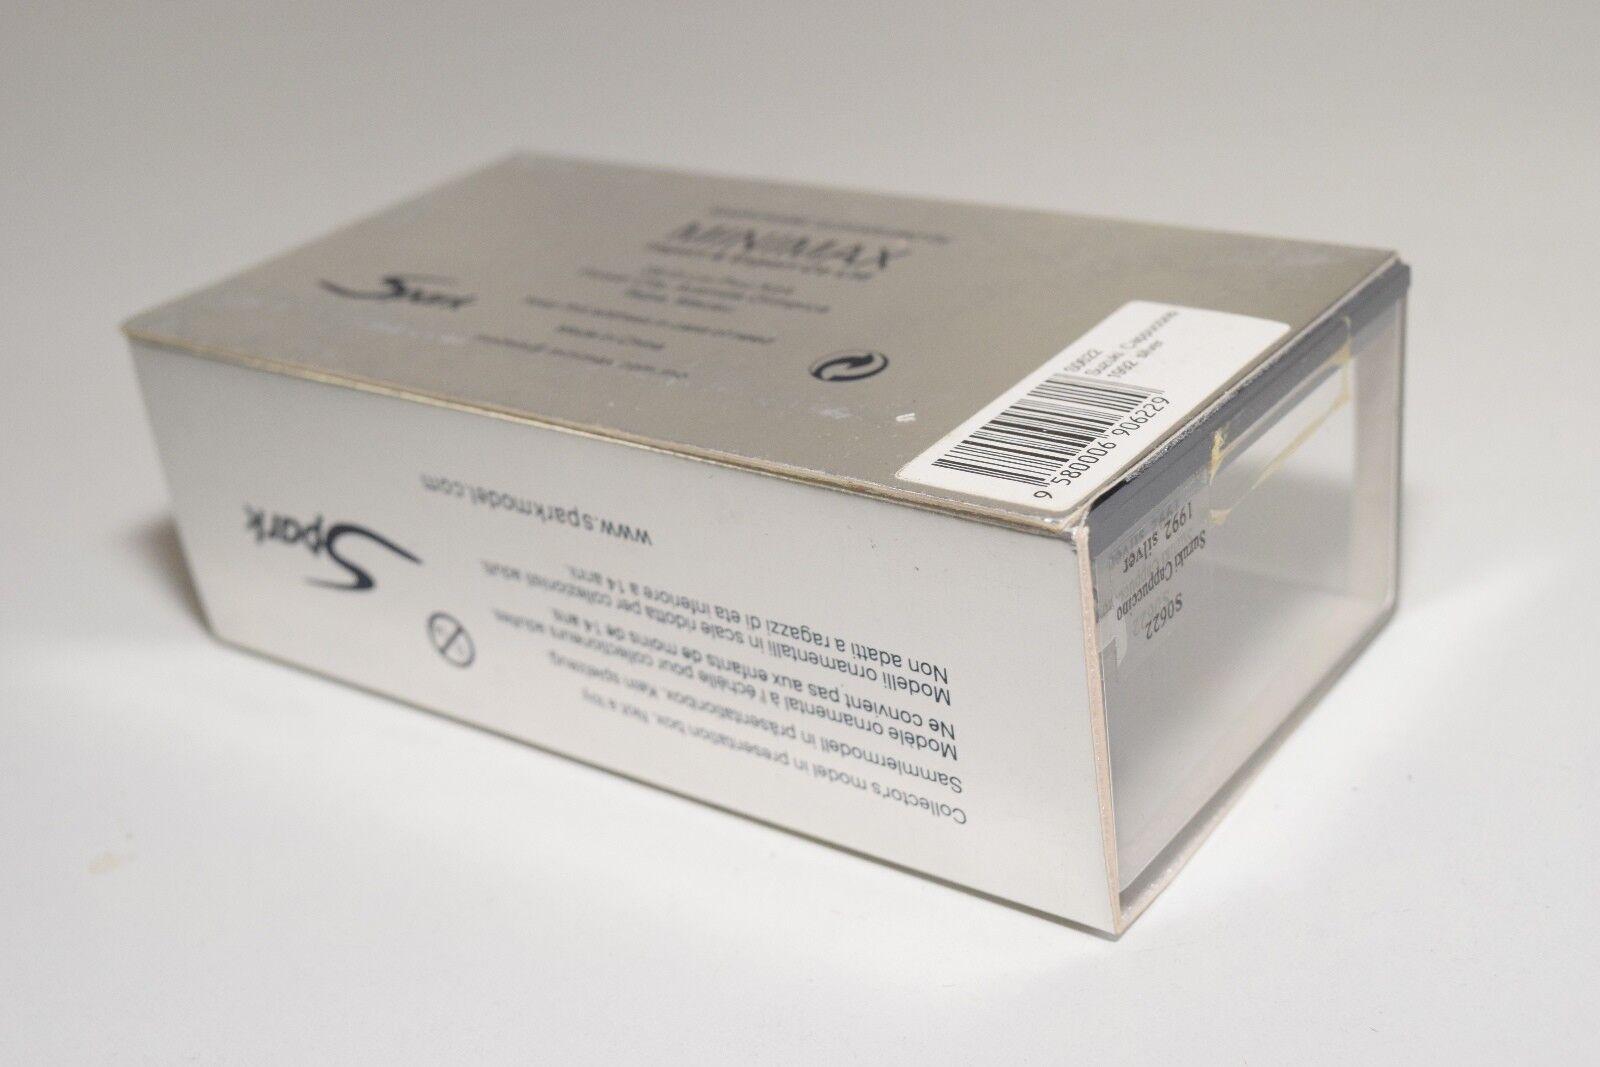 T SPARK S0622 SUZUKI SUZUKI SUZUKI CAPPUCCINO 1992 plata MINT BOXED 872b12